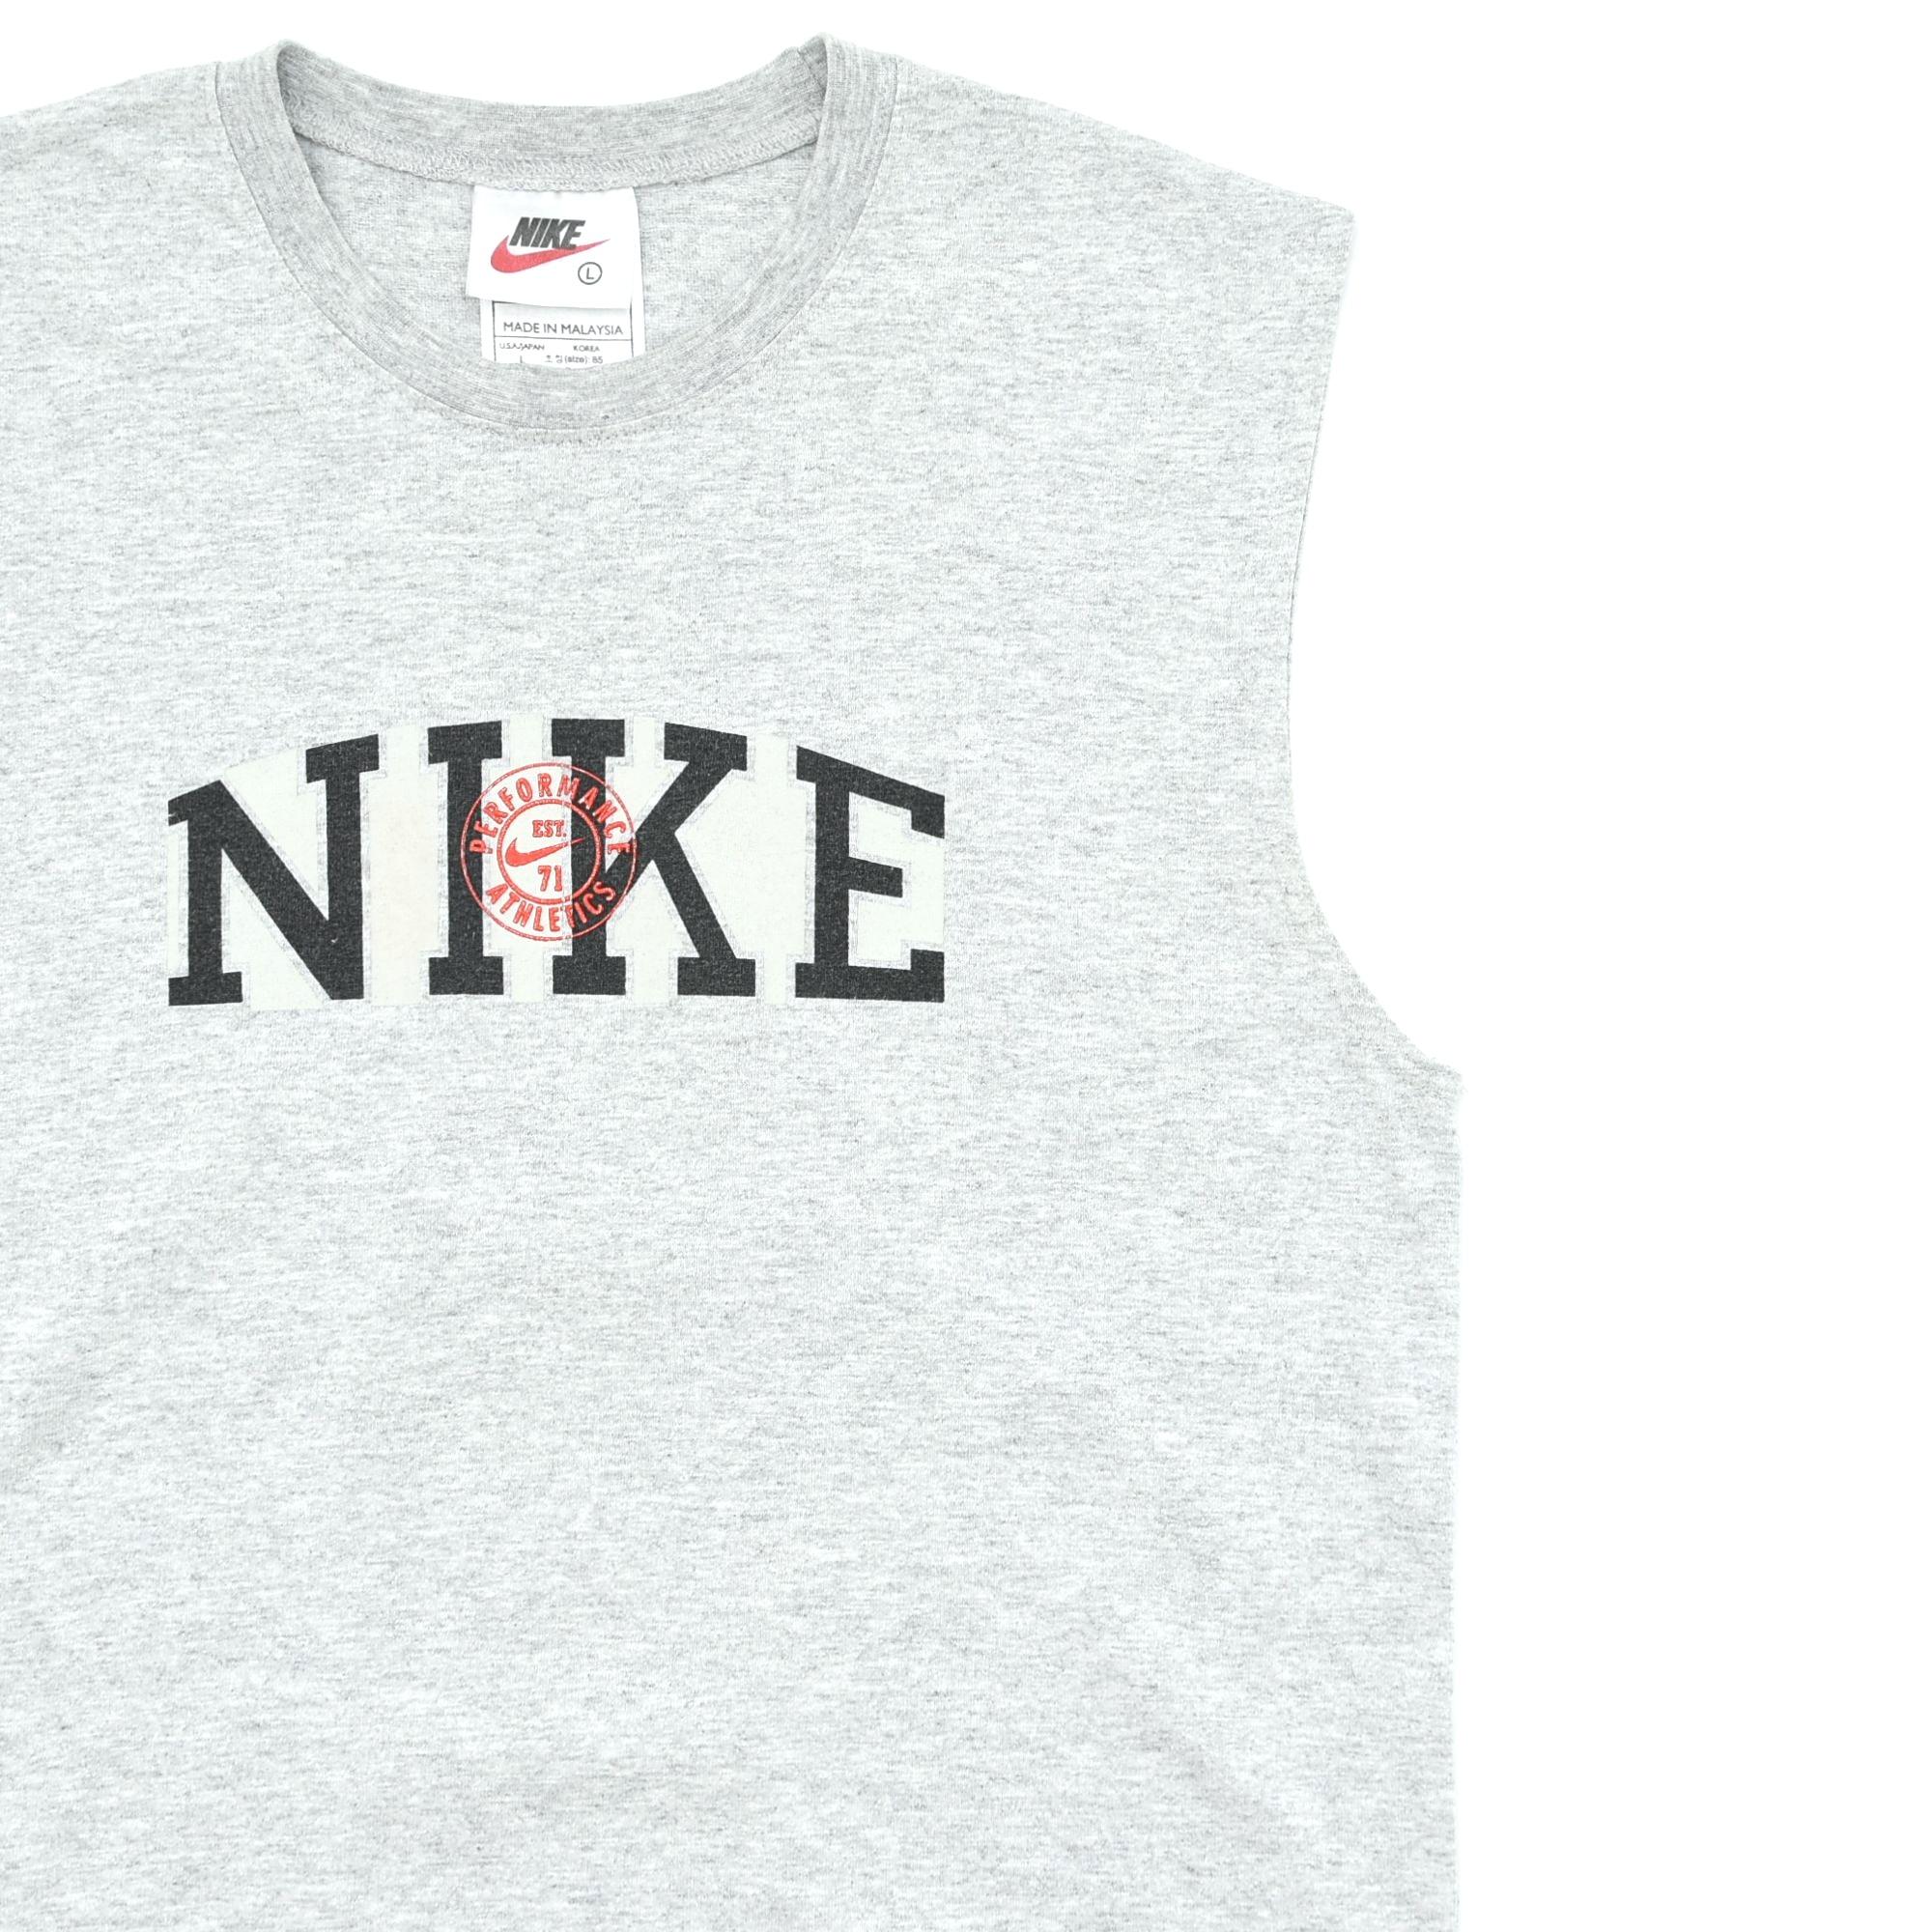 90's NIKE logo print sleeveless T-shirt